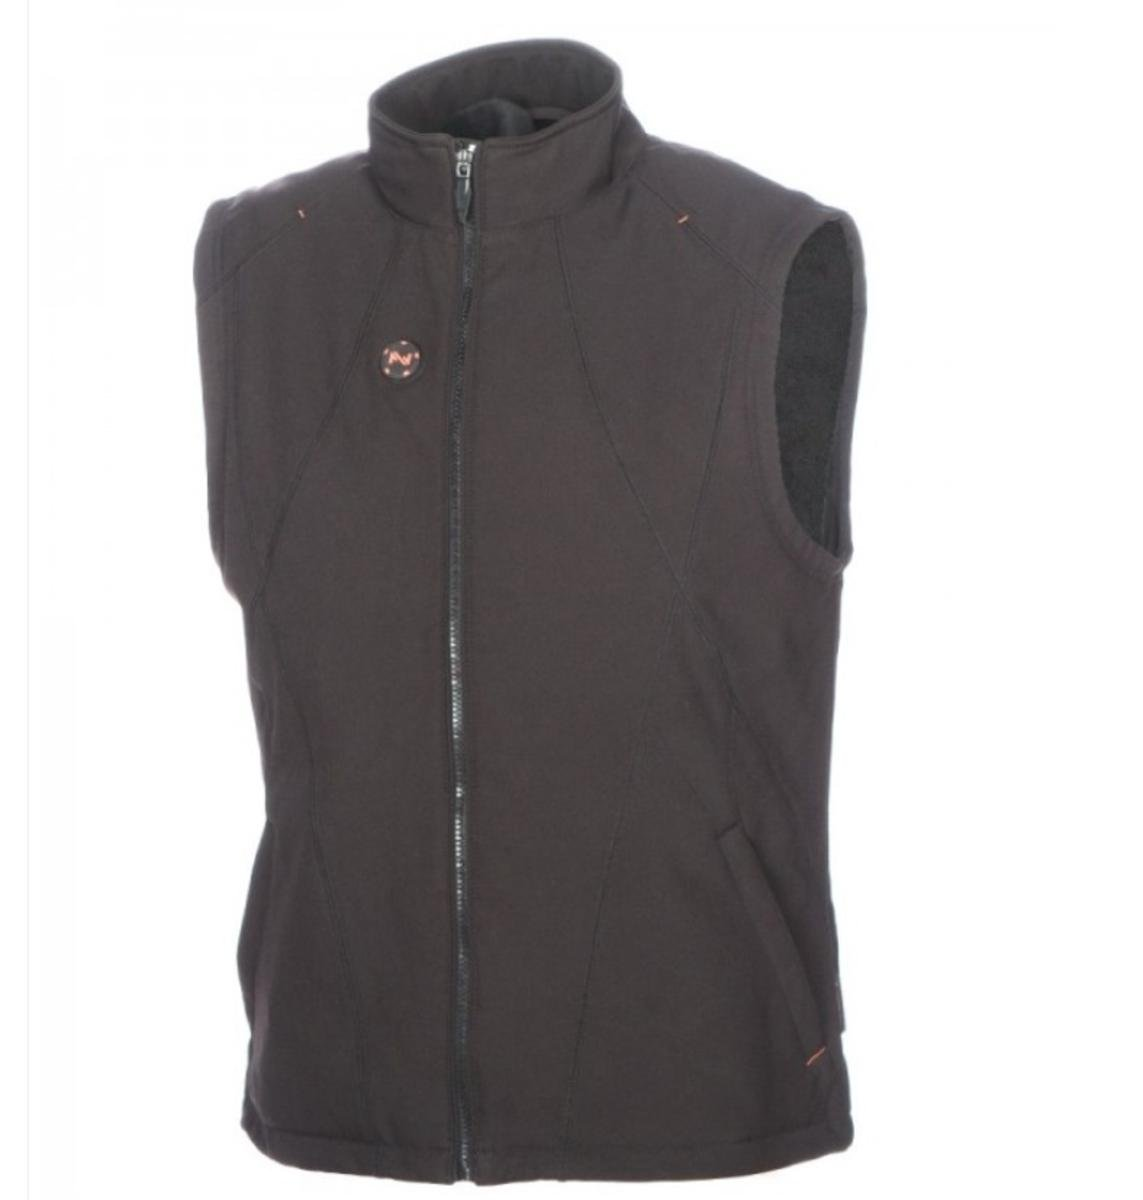 Mobile Warming Unisex-Adult Dual Power Heated 12v Vest (Black, Large)